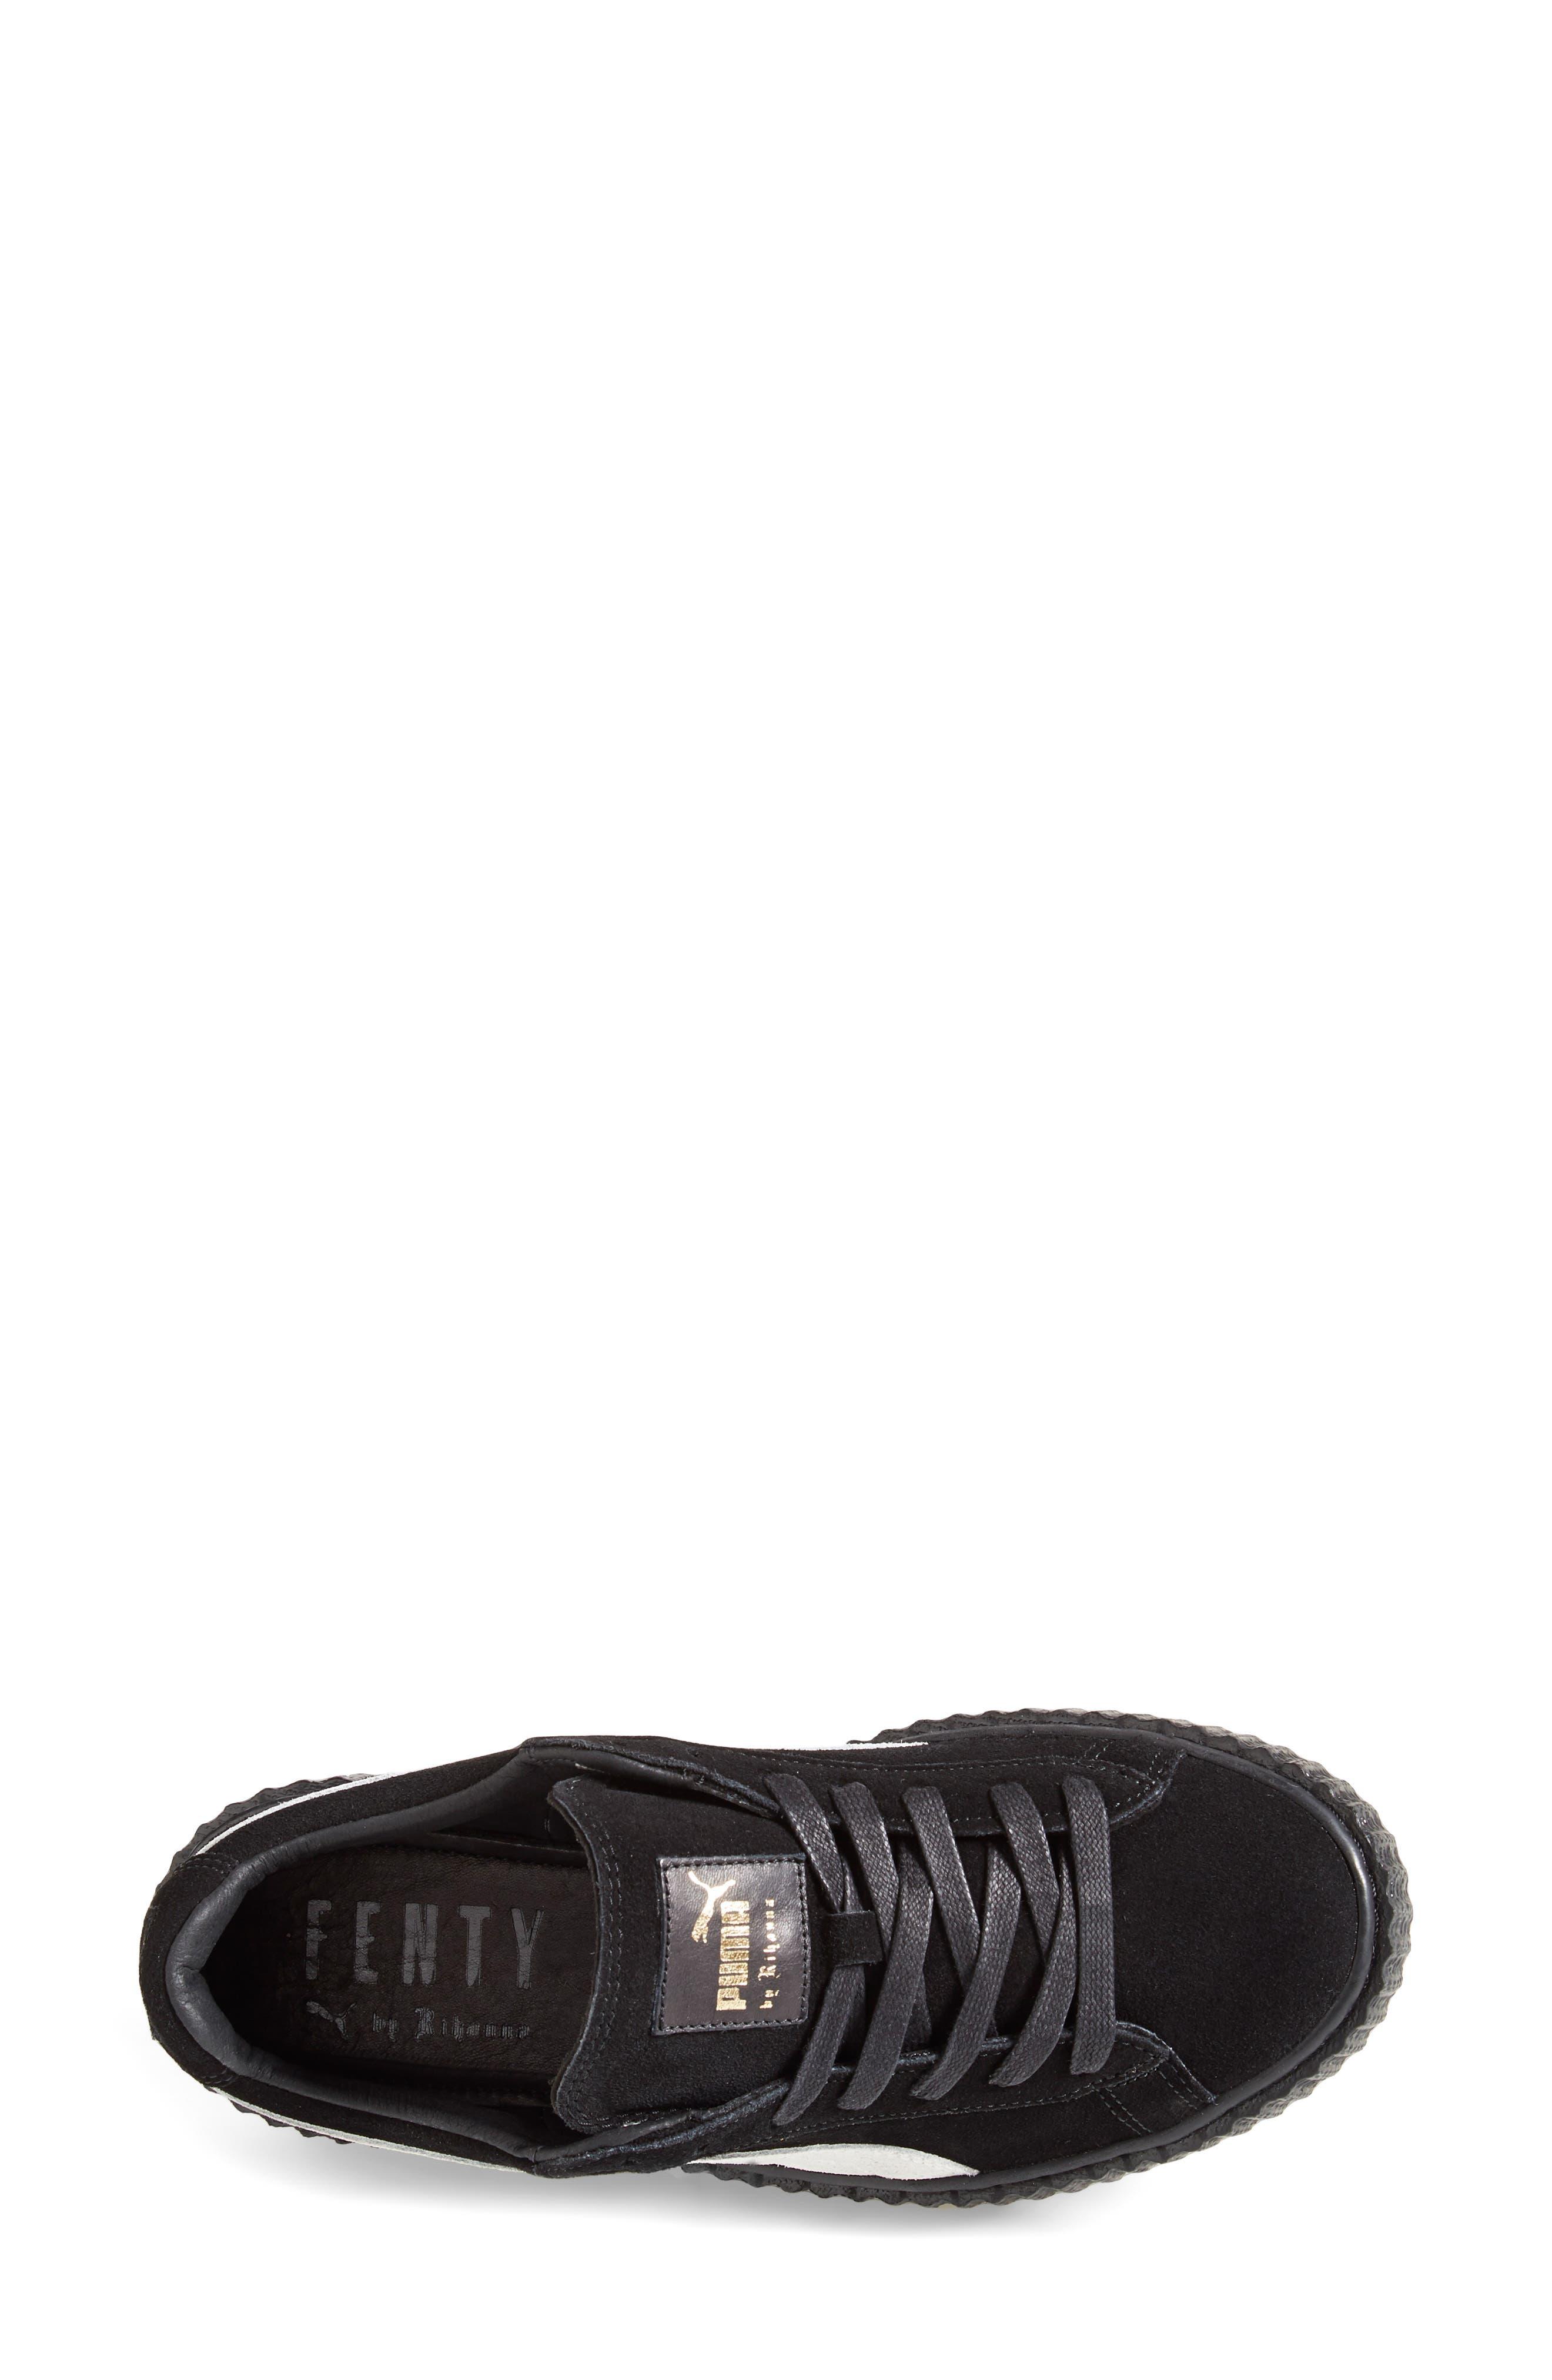 FENTY PUMA by Rihanna Creeper Sneaker,                             Alternate thumbnail 4, color,                             001